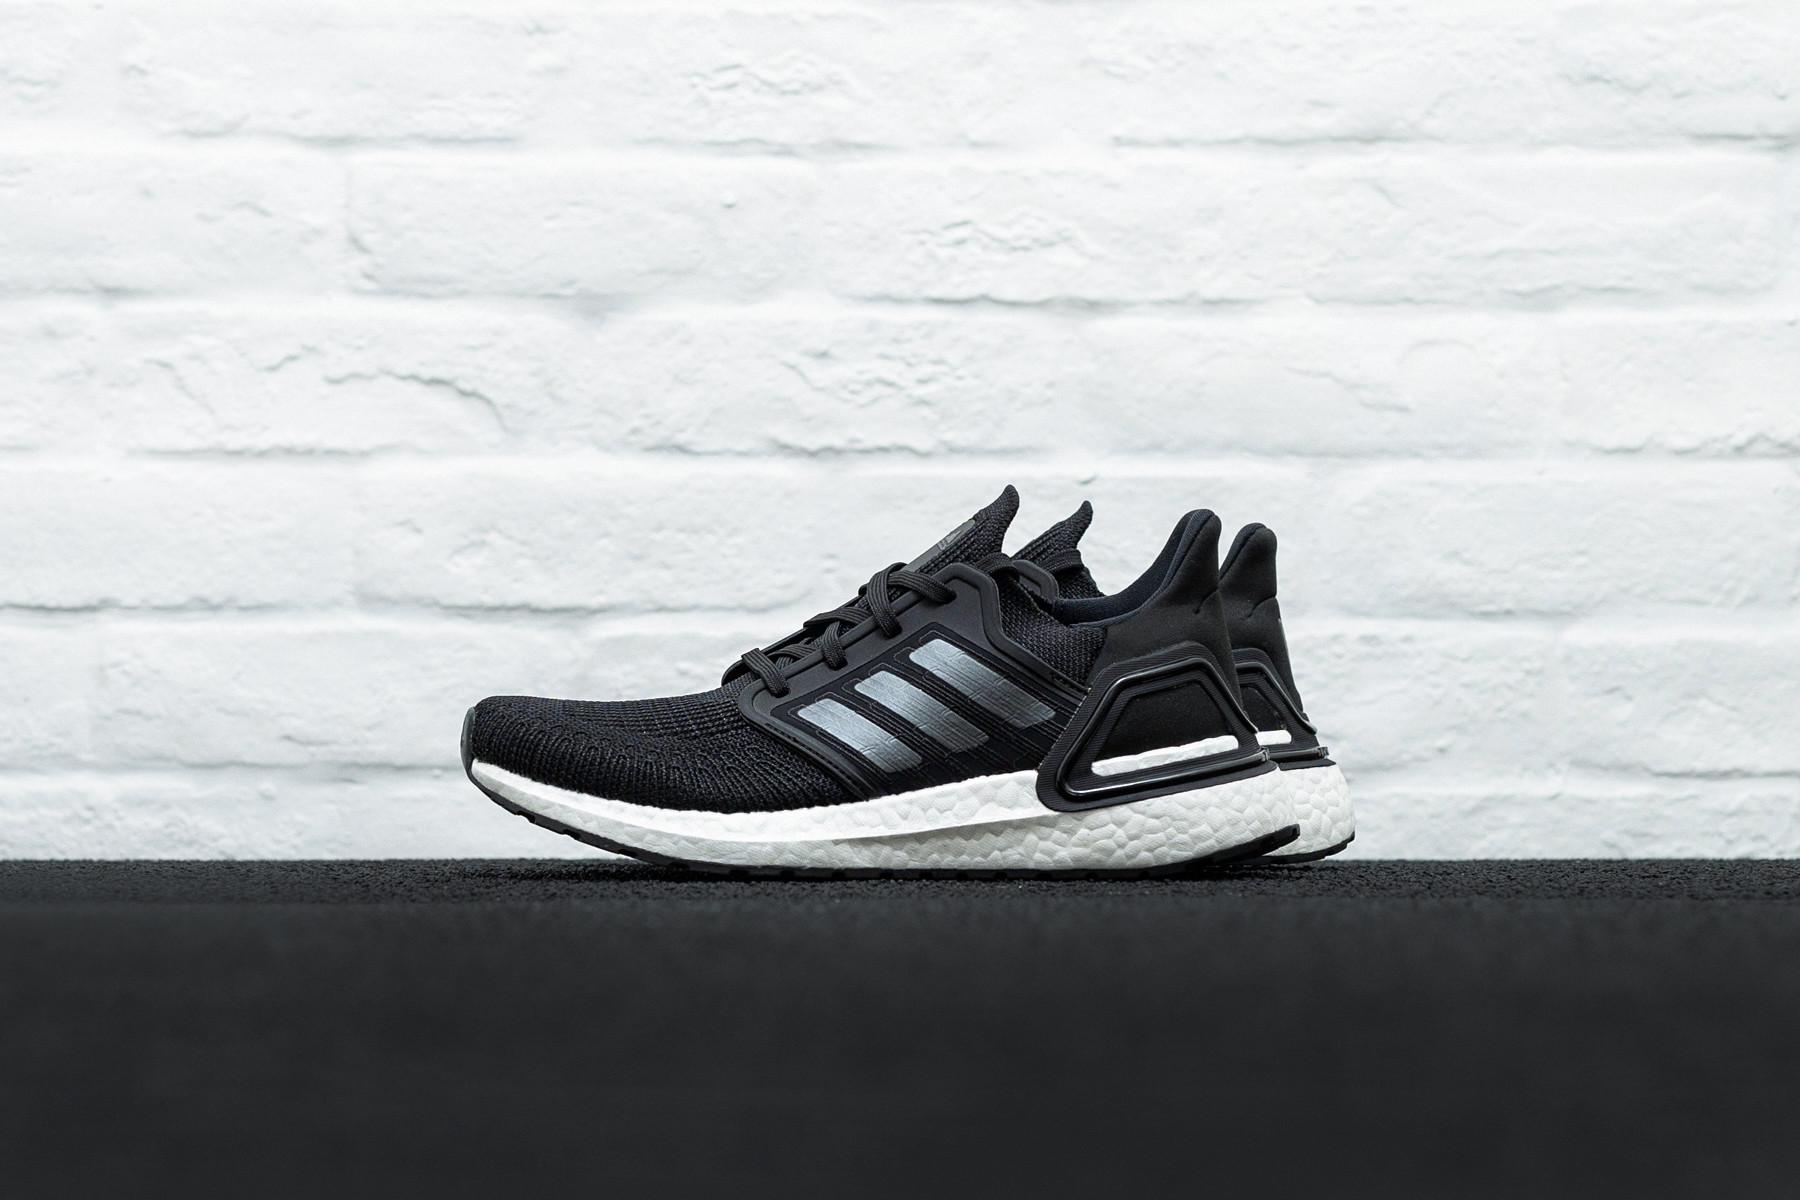 W Adidas UltraBoost 20 | Favoritter fra Adidas finner du hos